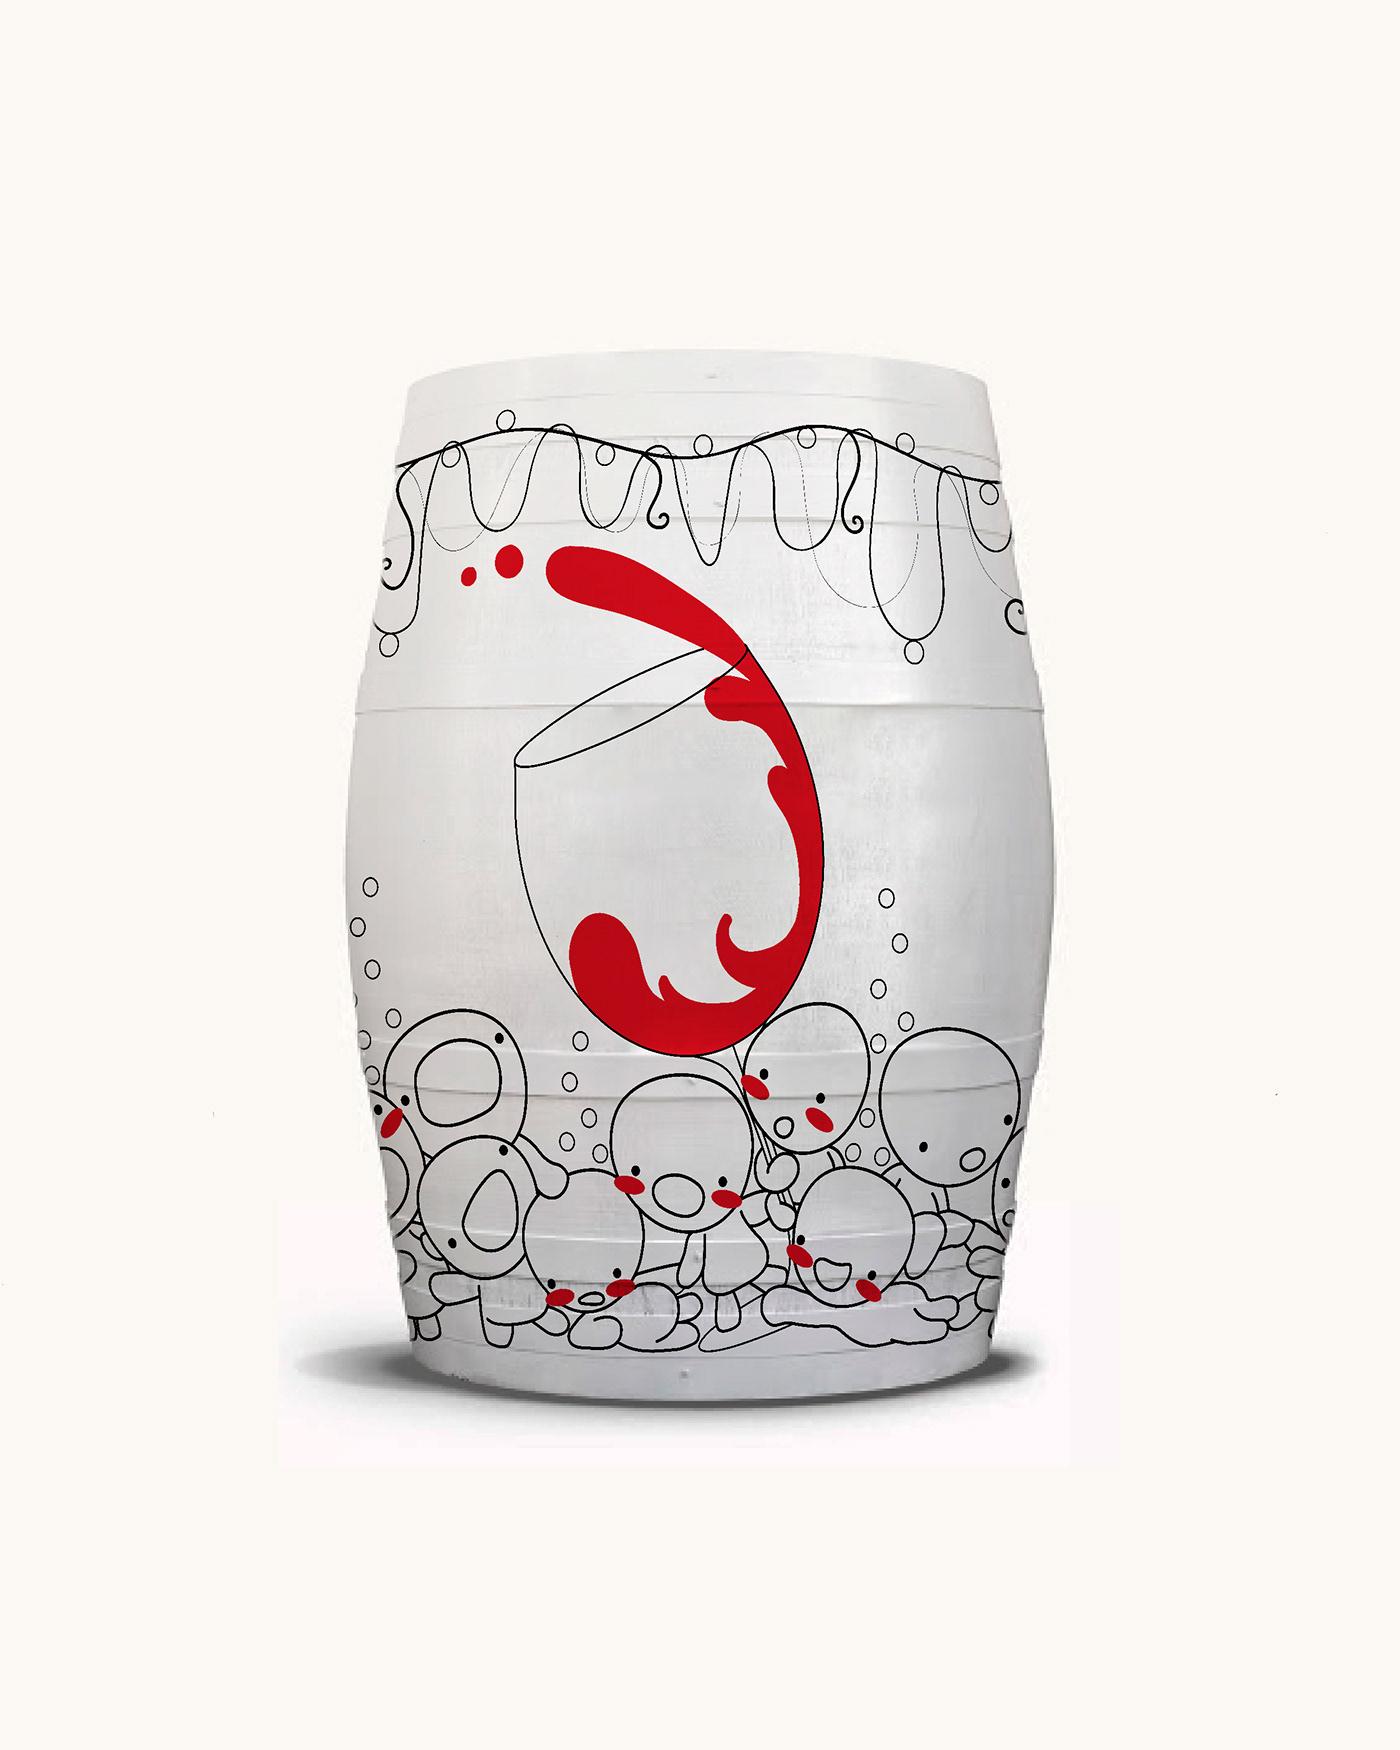 BARRICA Concurso diseño ilustracion vino Digital Art